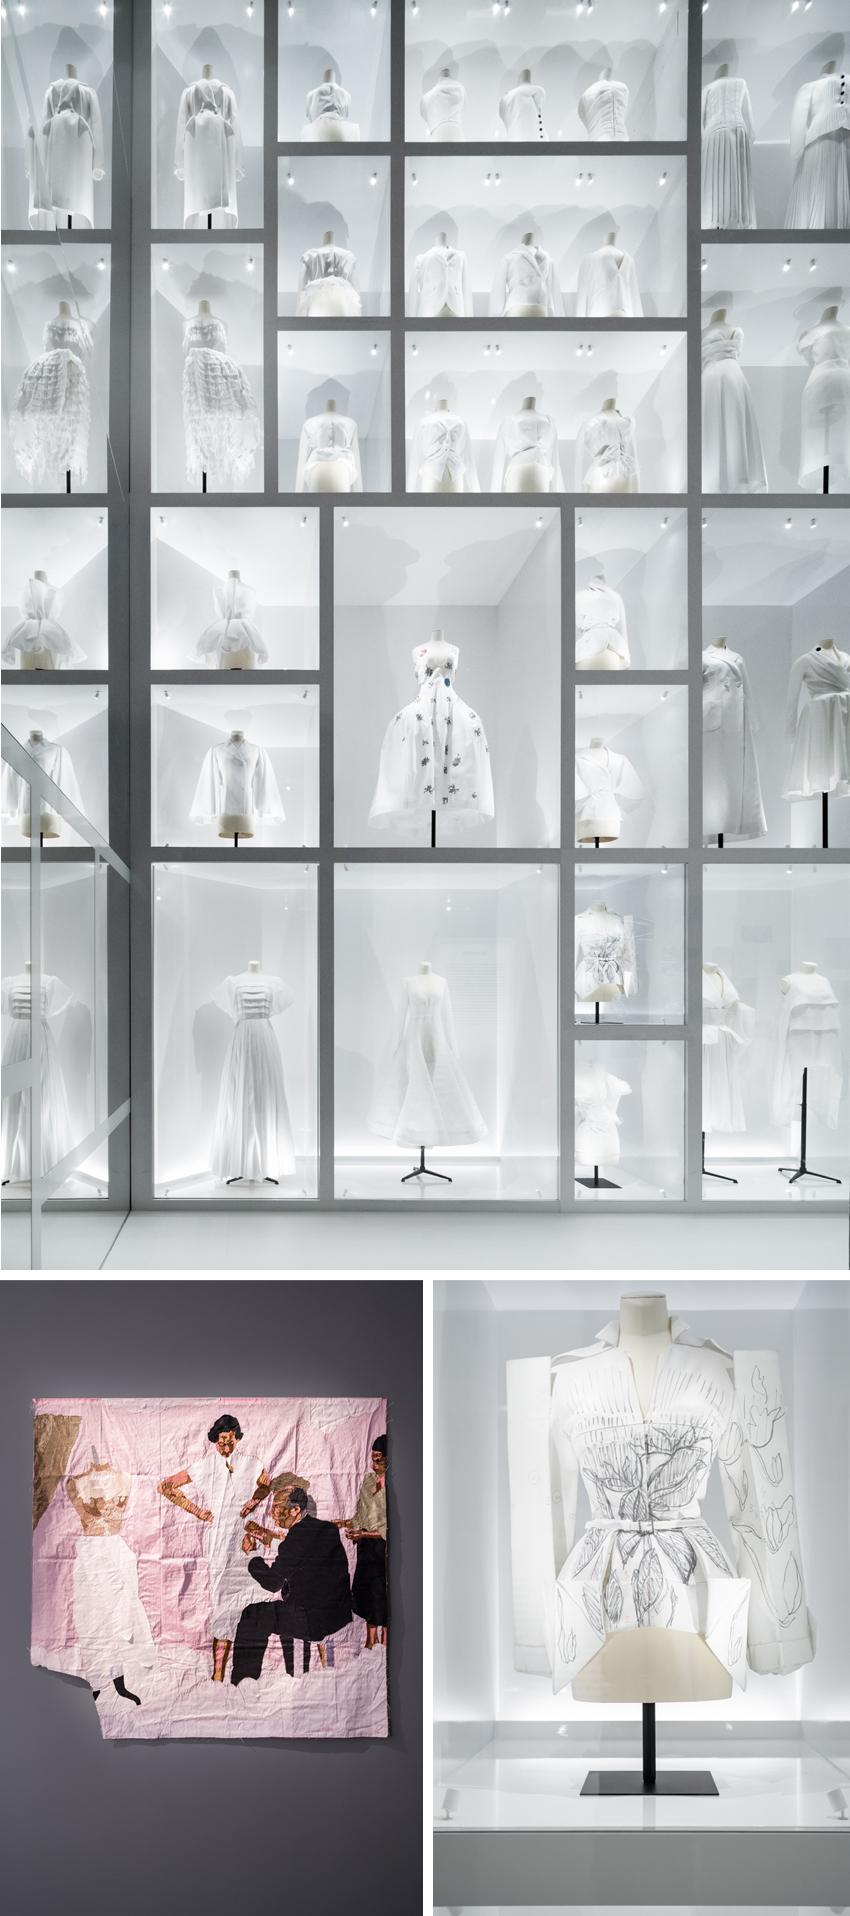 Christian Dior Designer of Dream Exhibition in Brooklyn